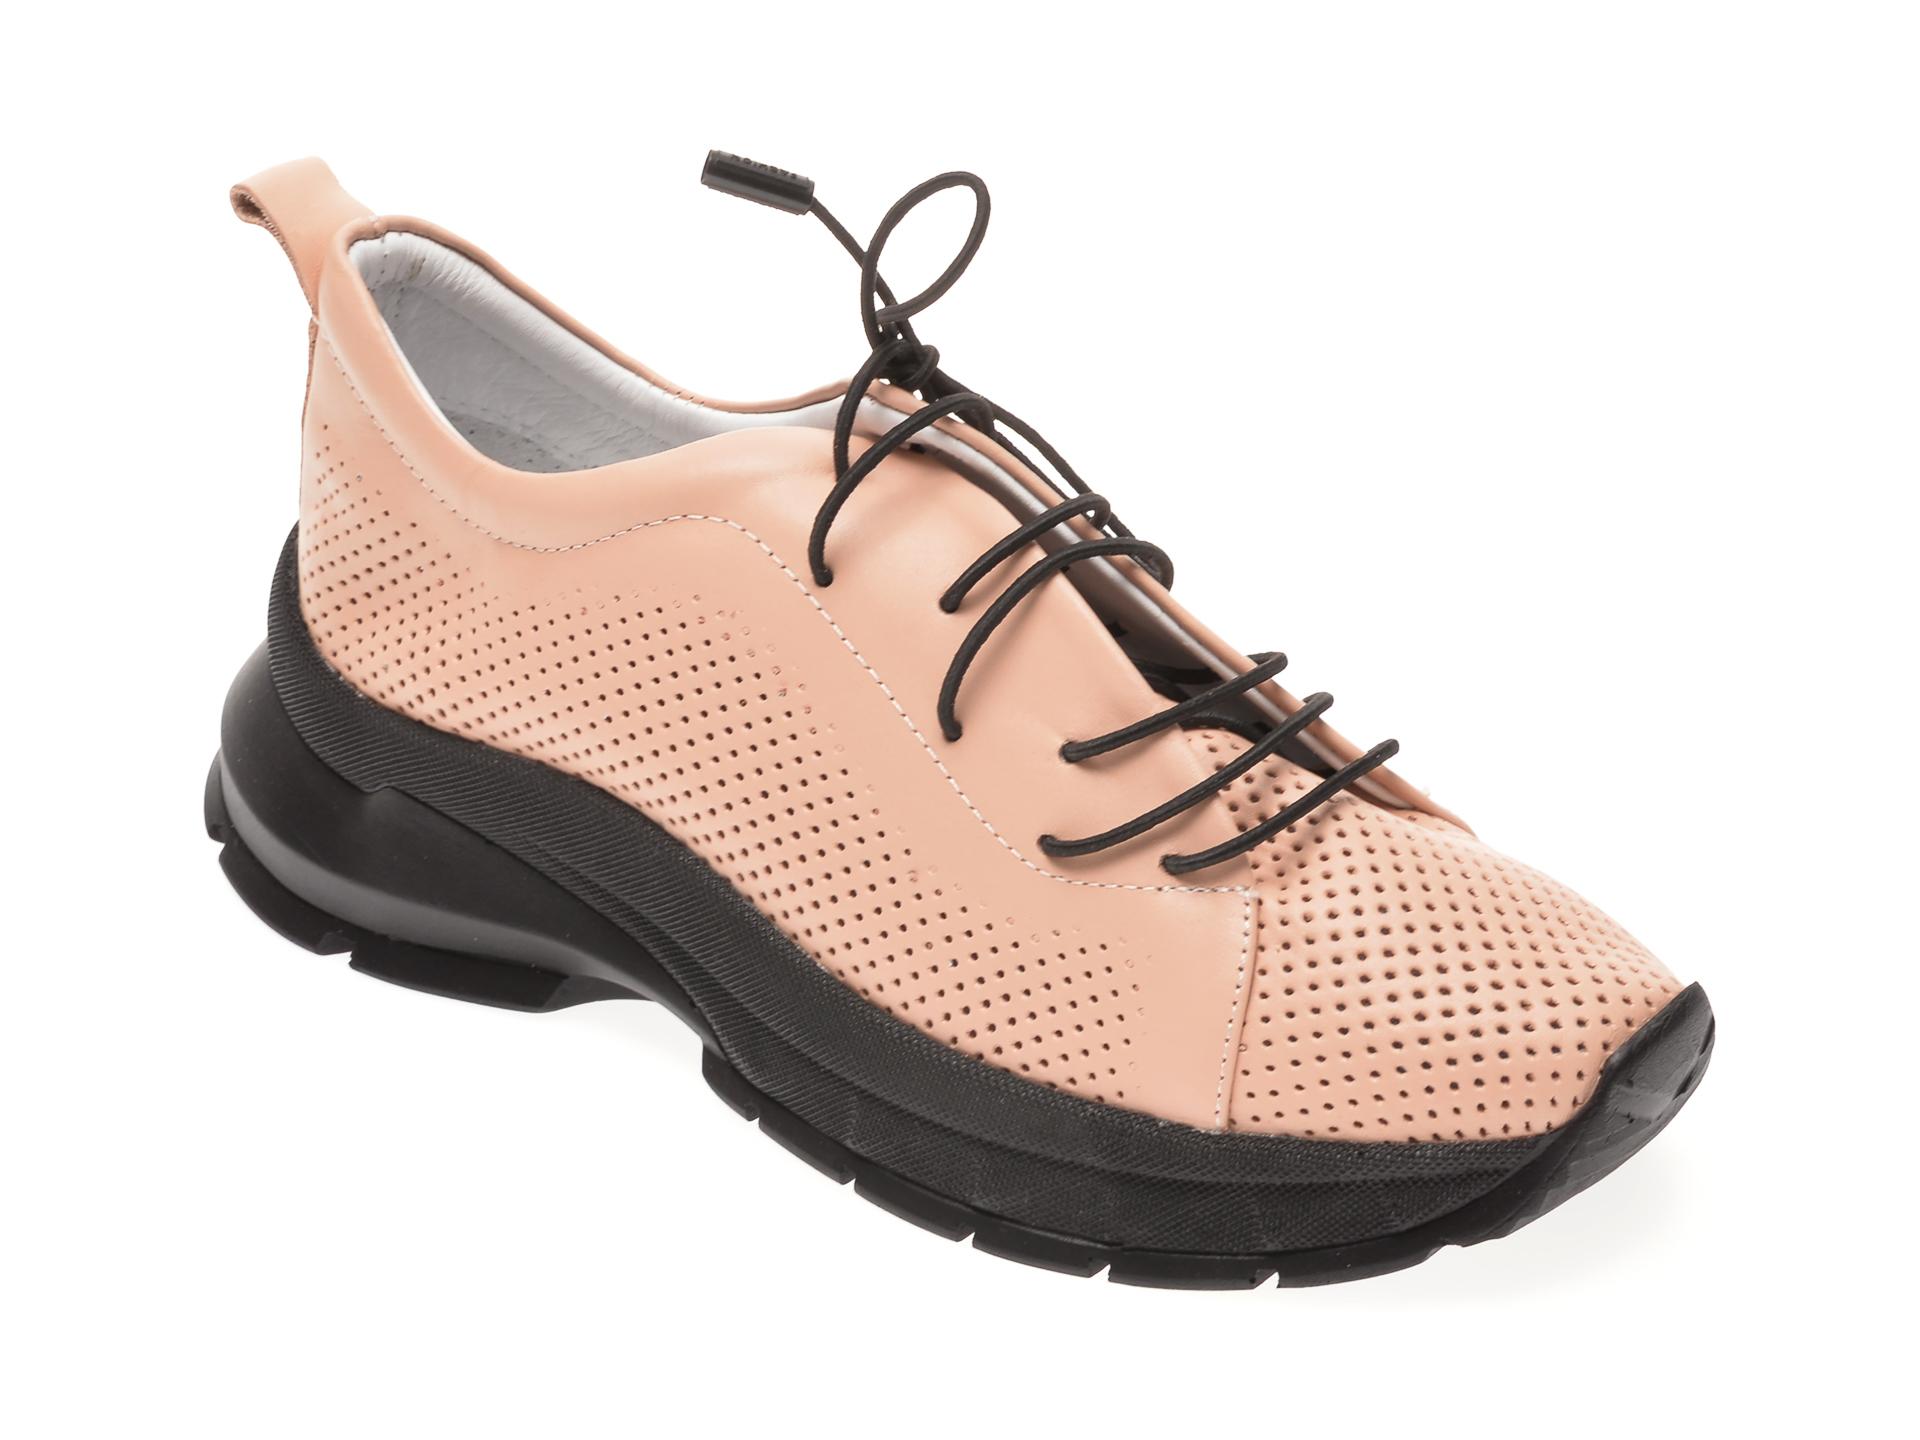 Pantofi FLAVIA PASSINI nude, 605, din piele naturala